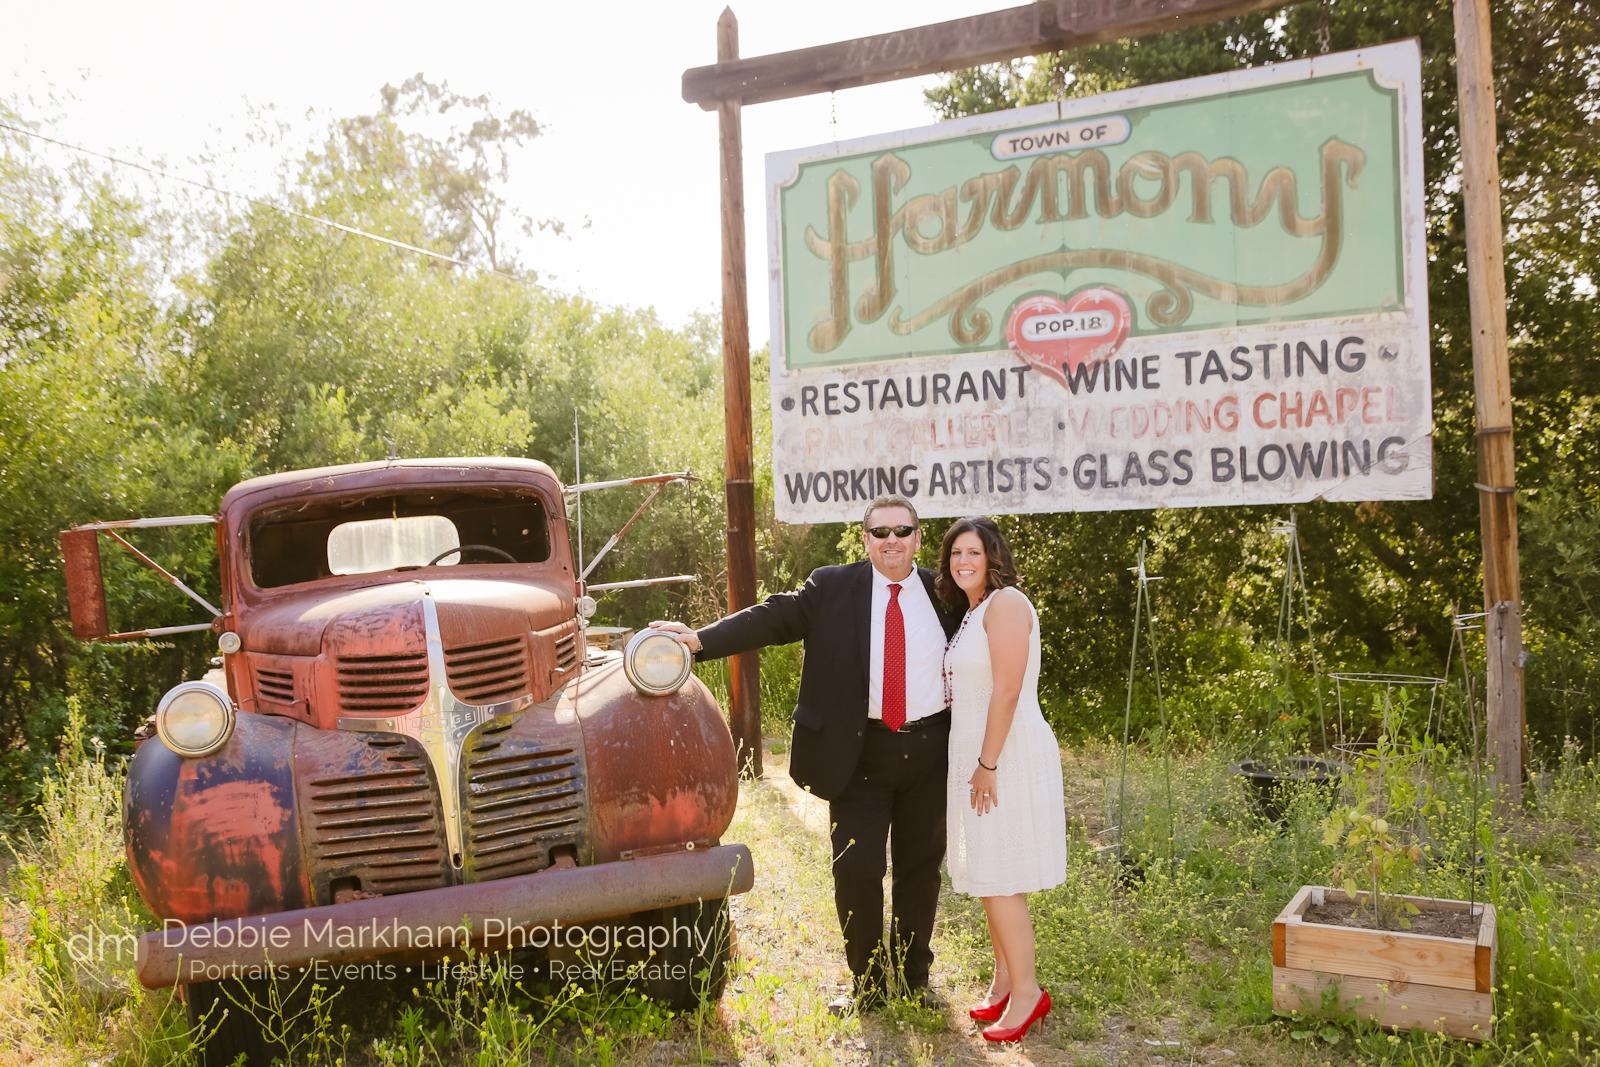 Debbie-Markham-Photography_Small-Town-Wedding_Destination-Wedding_California_Central-Coast-2037.jpg